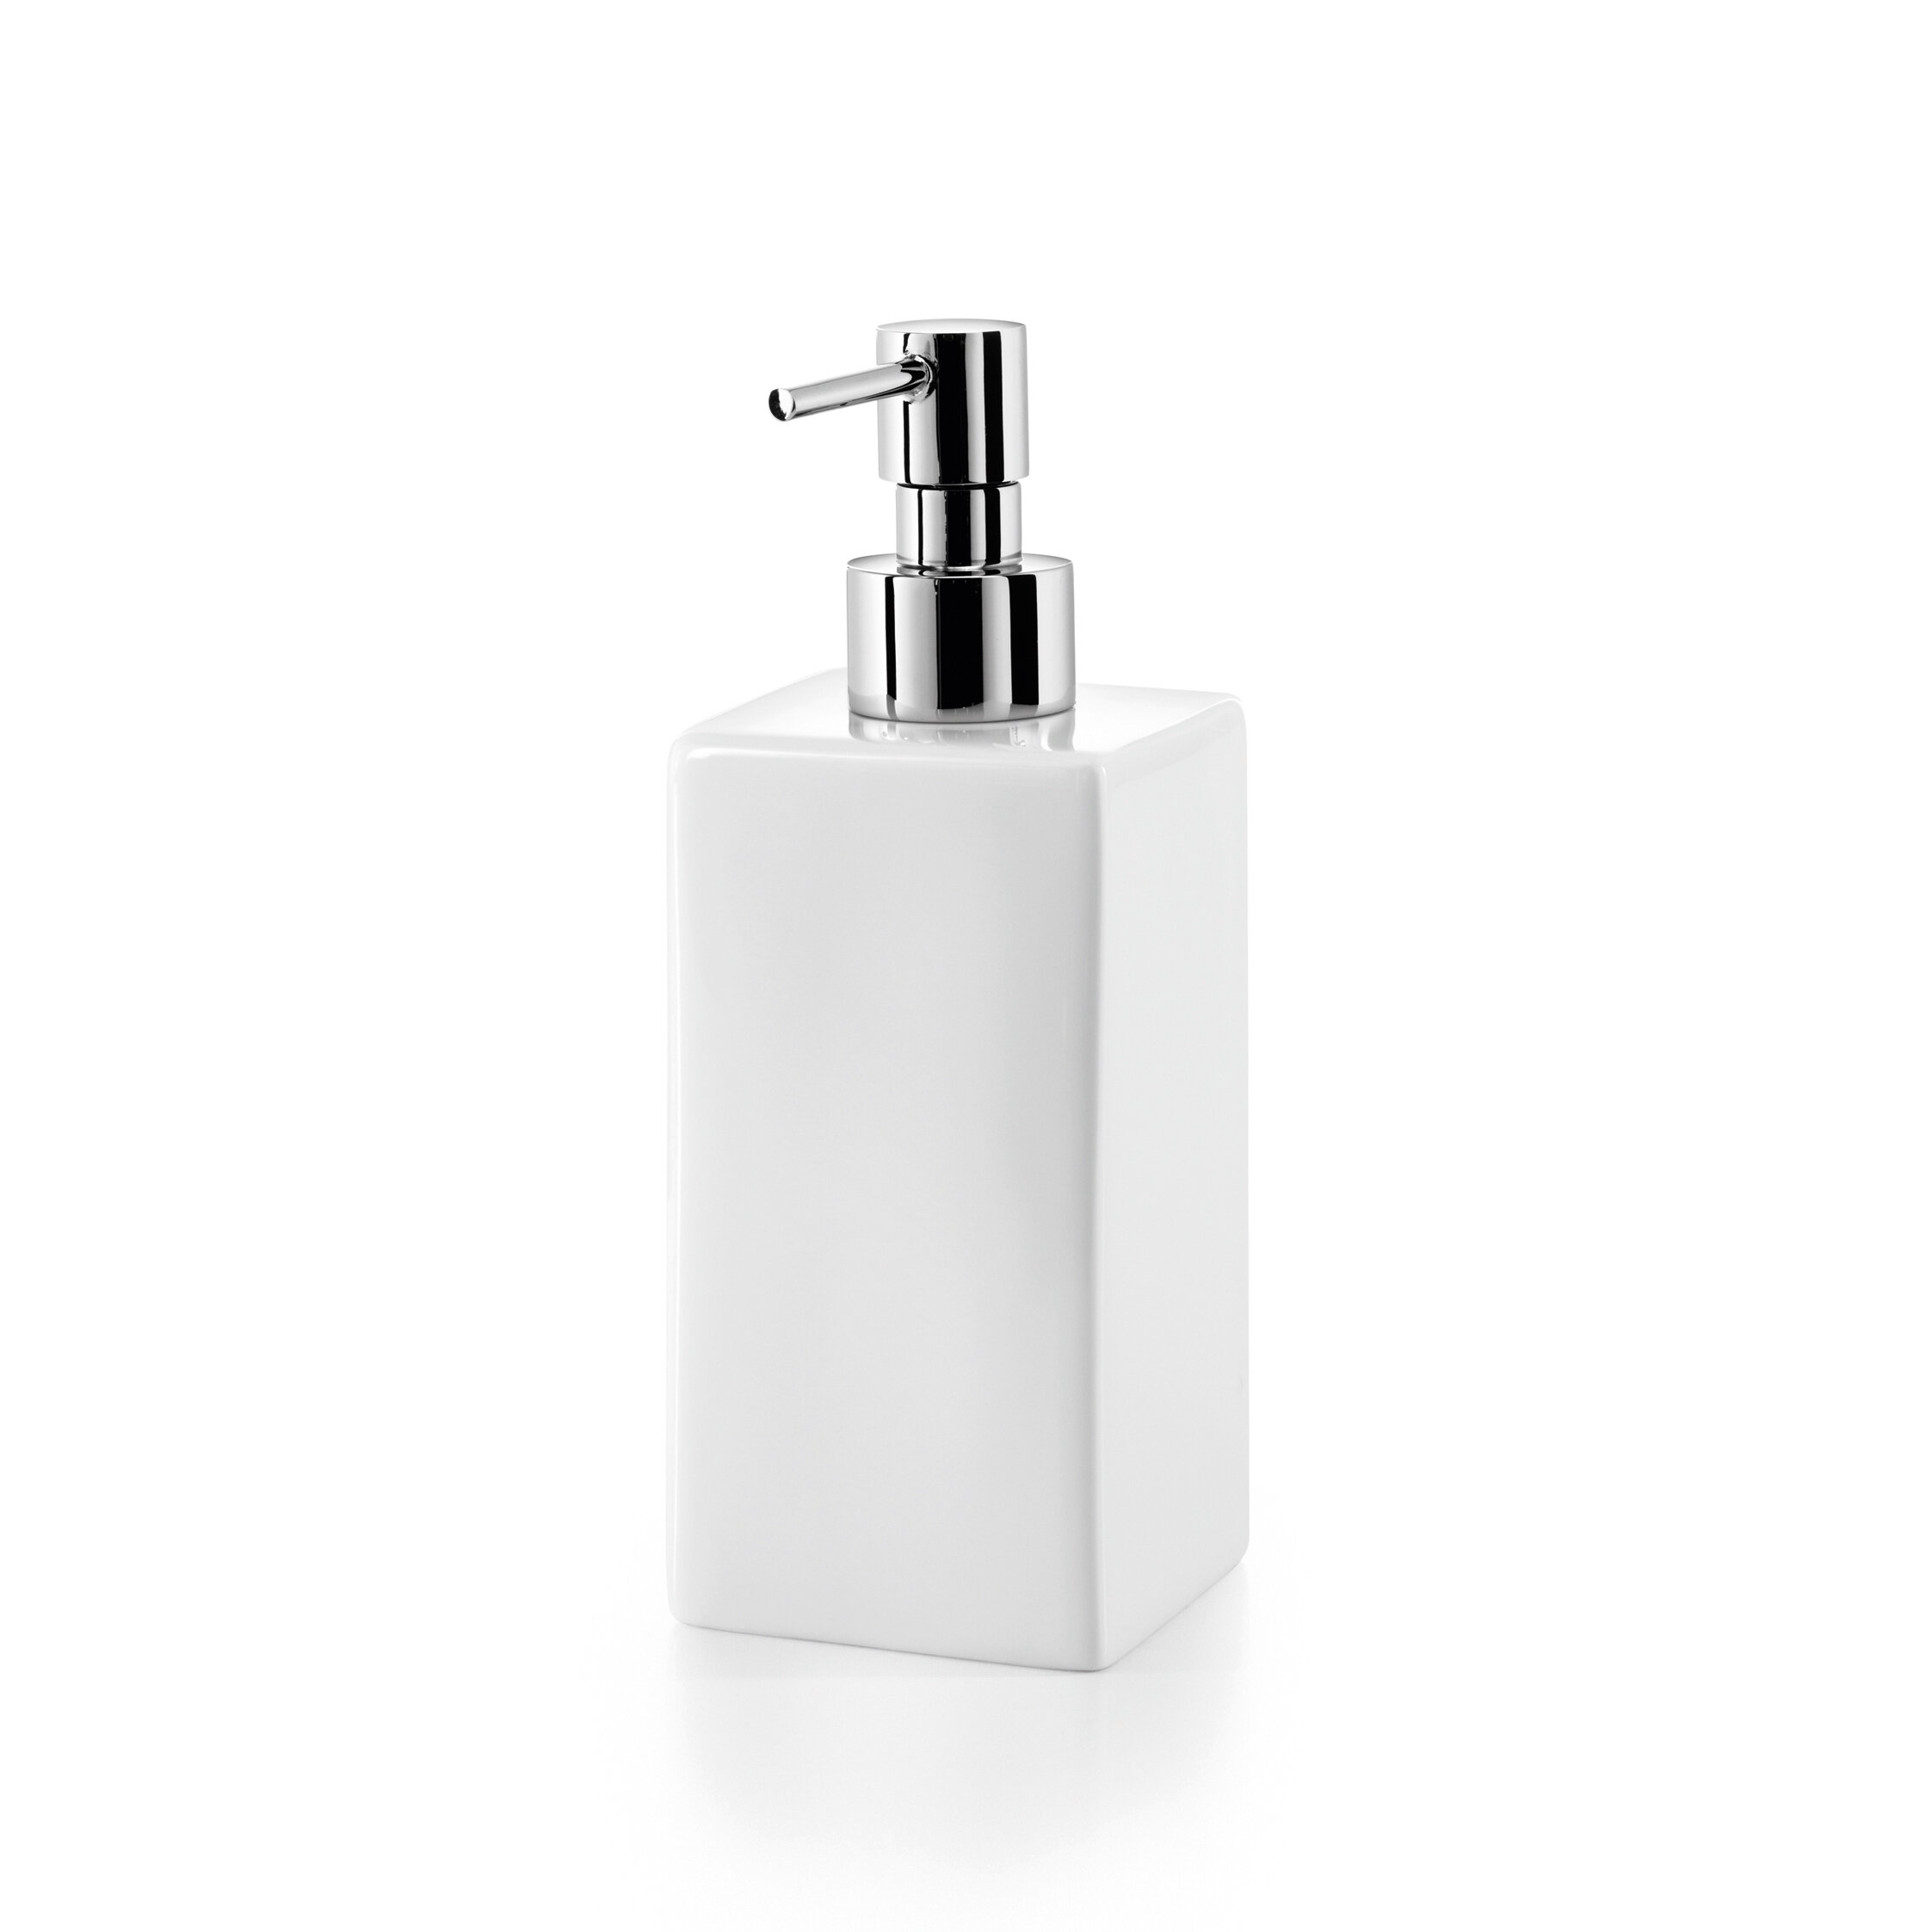 WS Bath Collections Complements Saon Soap Dispenser | Wayfair